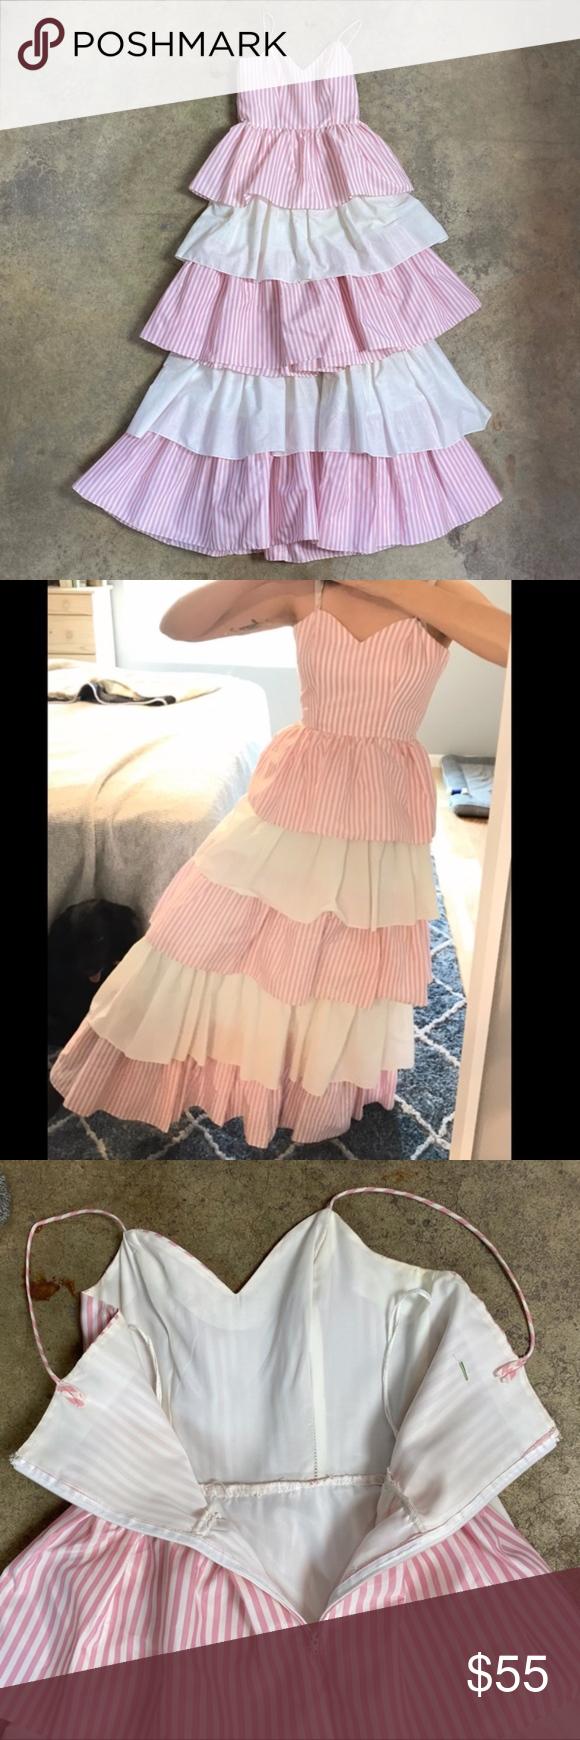 2pc Vintage Homemade Tiered Ruffle Bo Peep Dress True Vintage Hand Made Homemade Unbranded Wide Ruffles P Bo Peep Dress Fairy Princess Costume Vintage Dresses [ 1740 x 580 Pixel ]